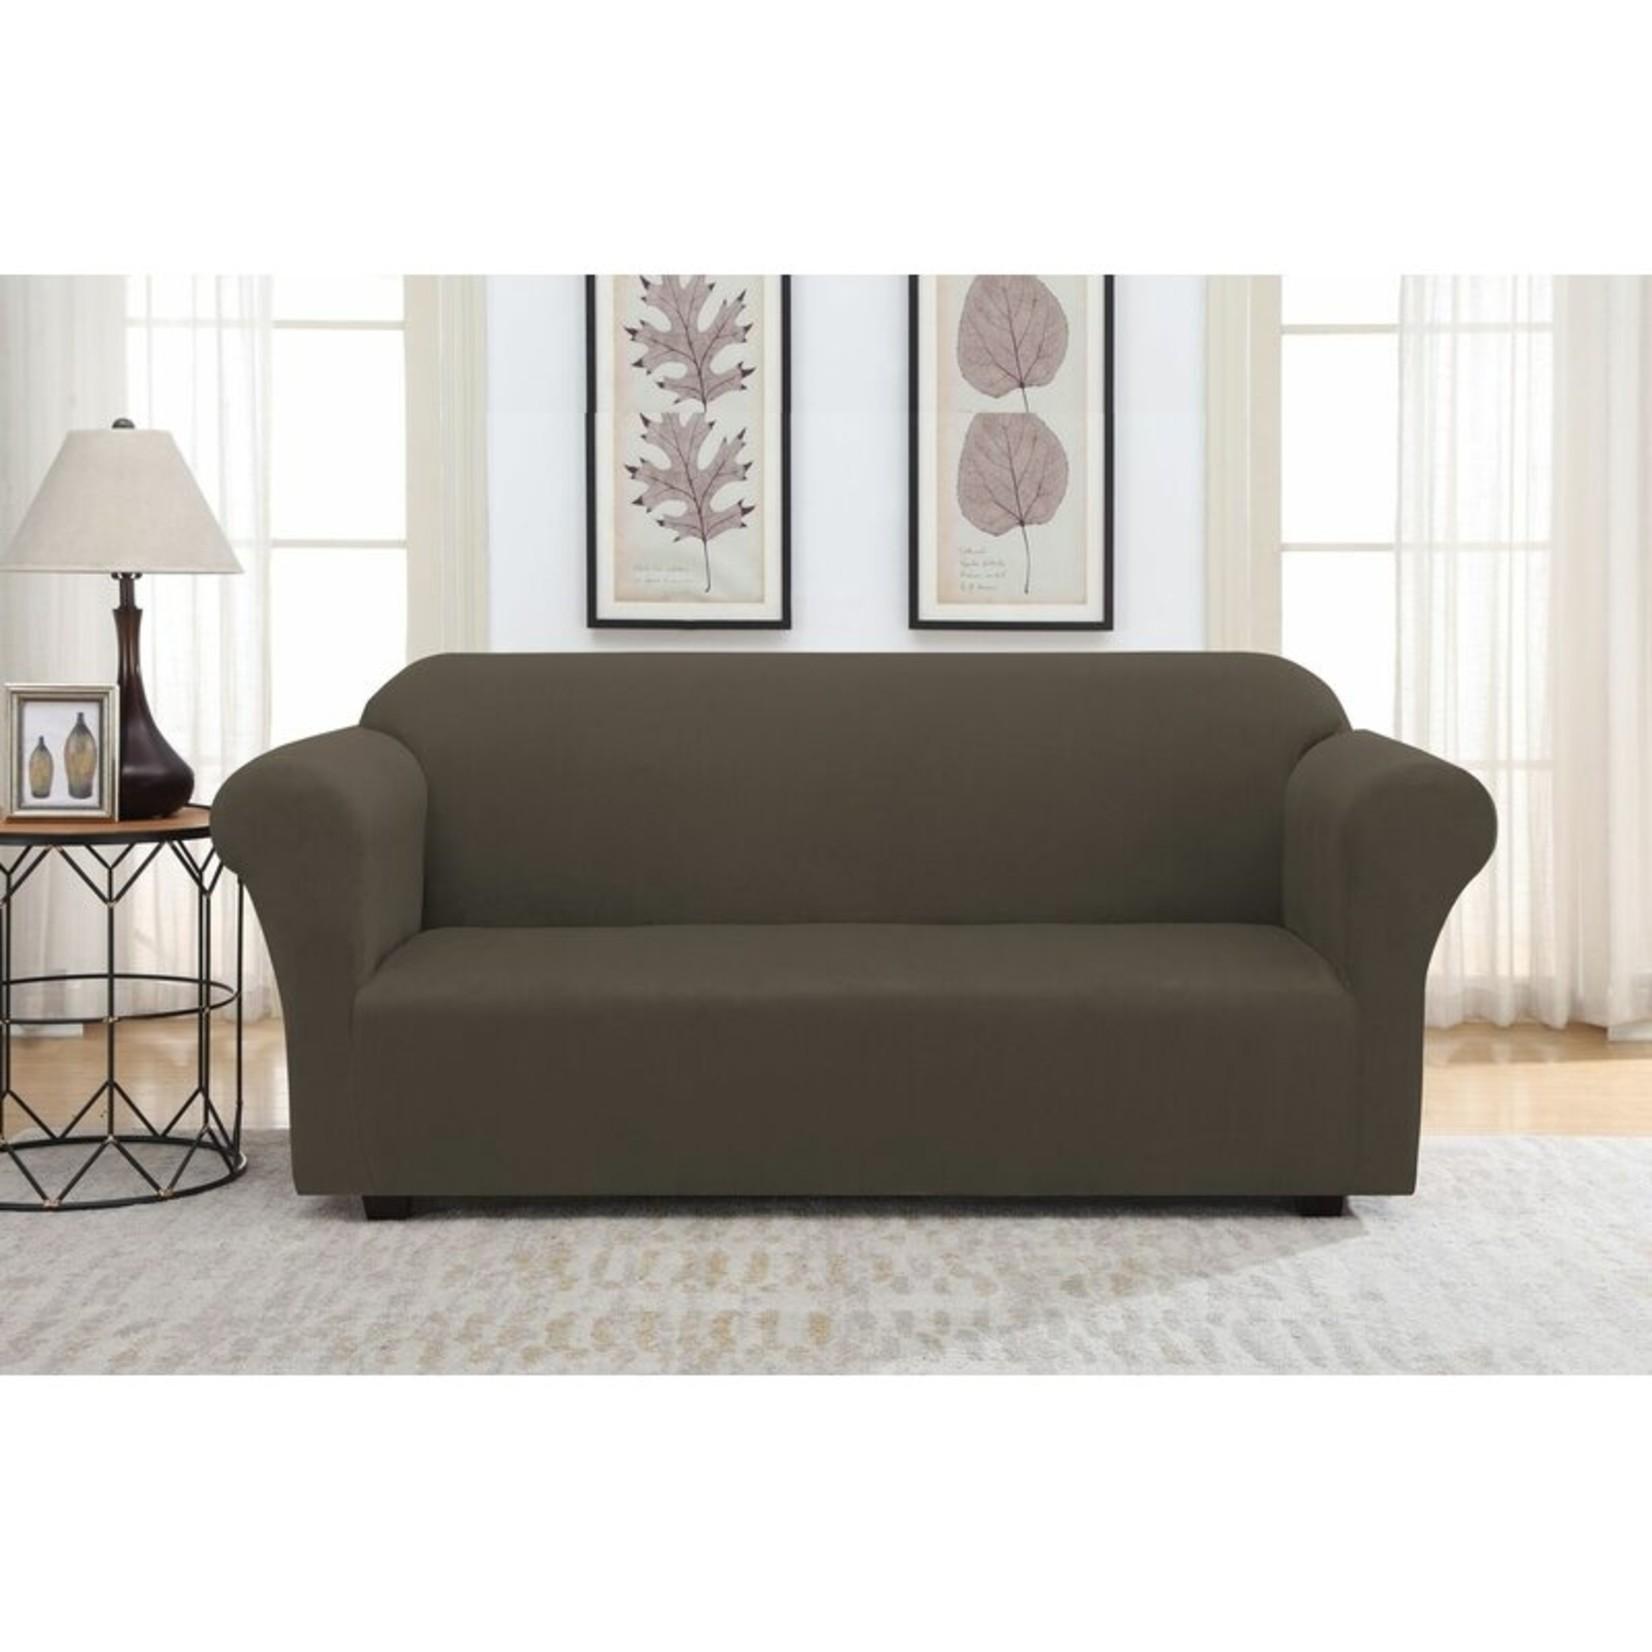 *Solid Suede Box Cushion Sofa Slipcover - Chocolate